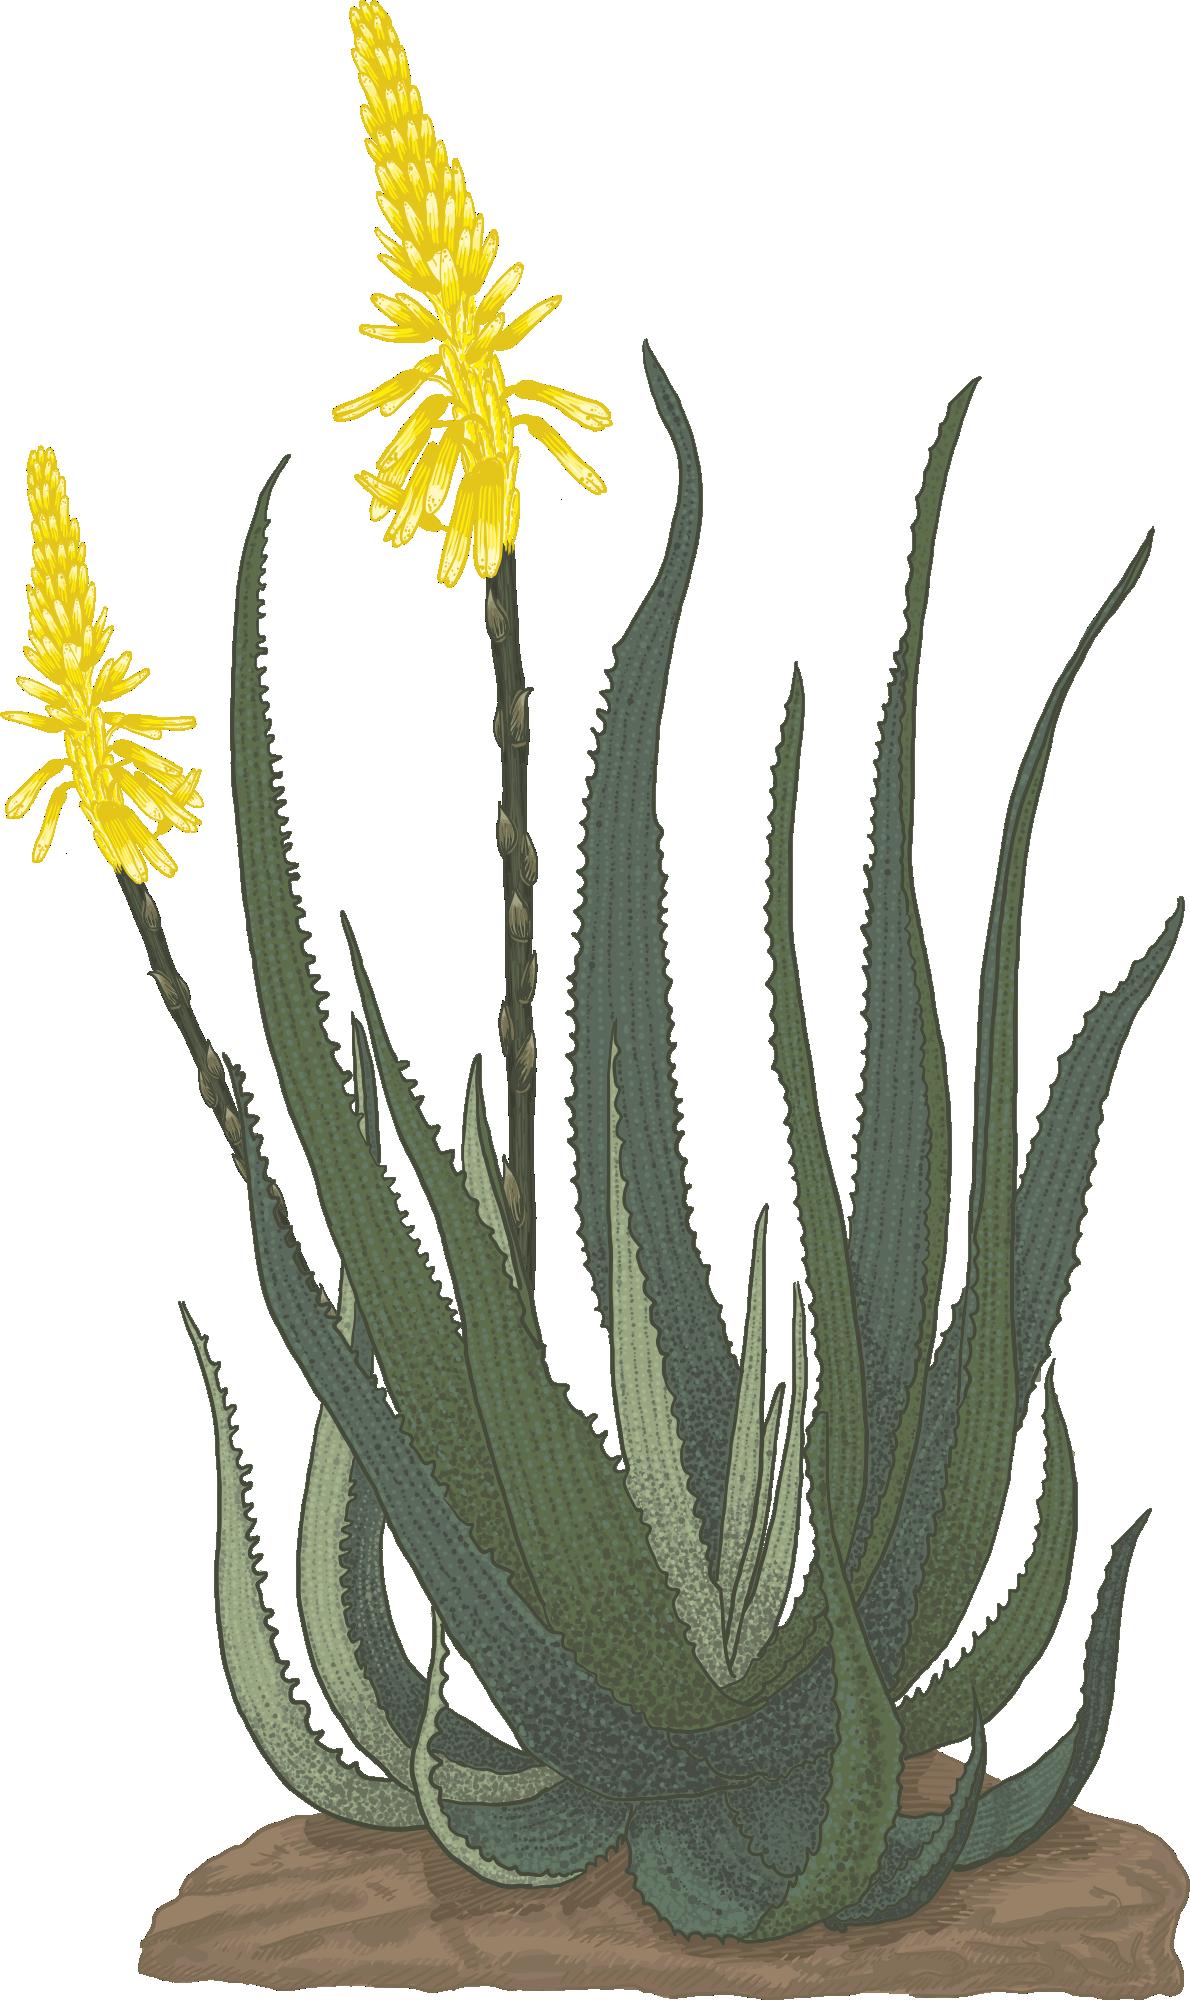 Hand drawn Botanical illustration